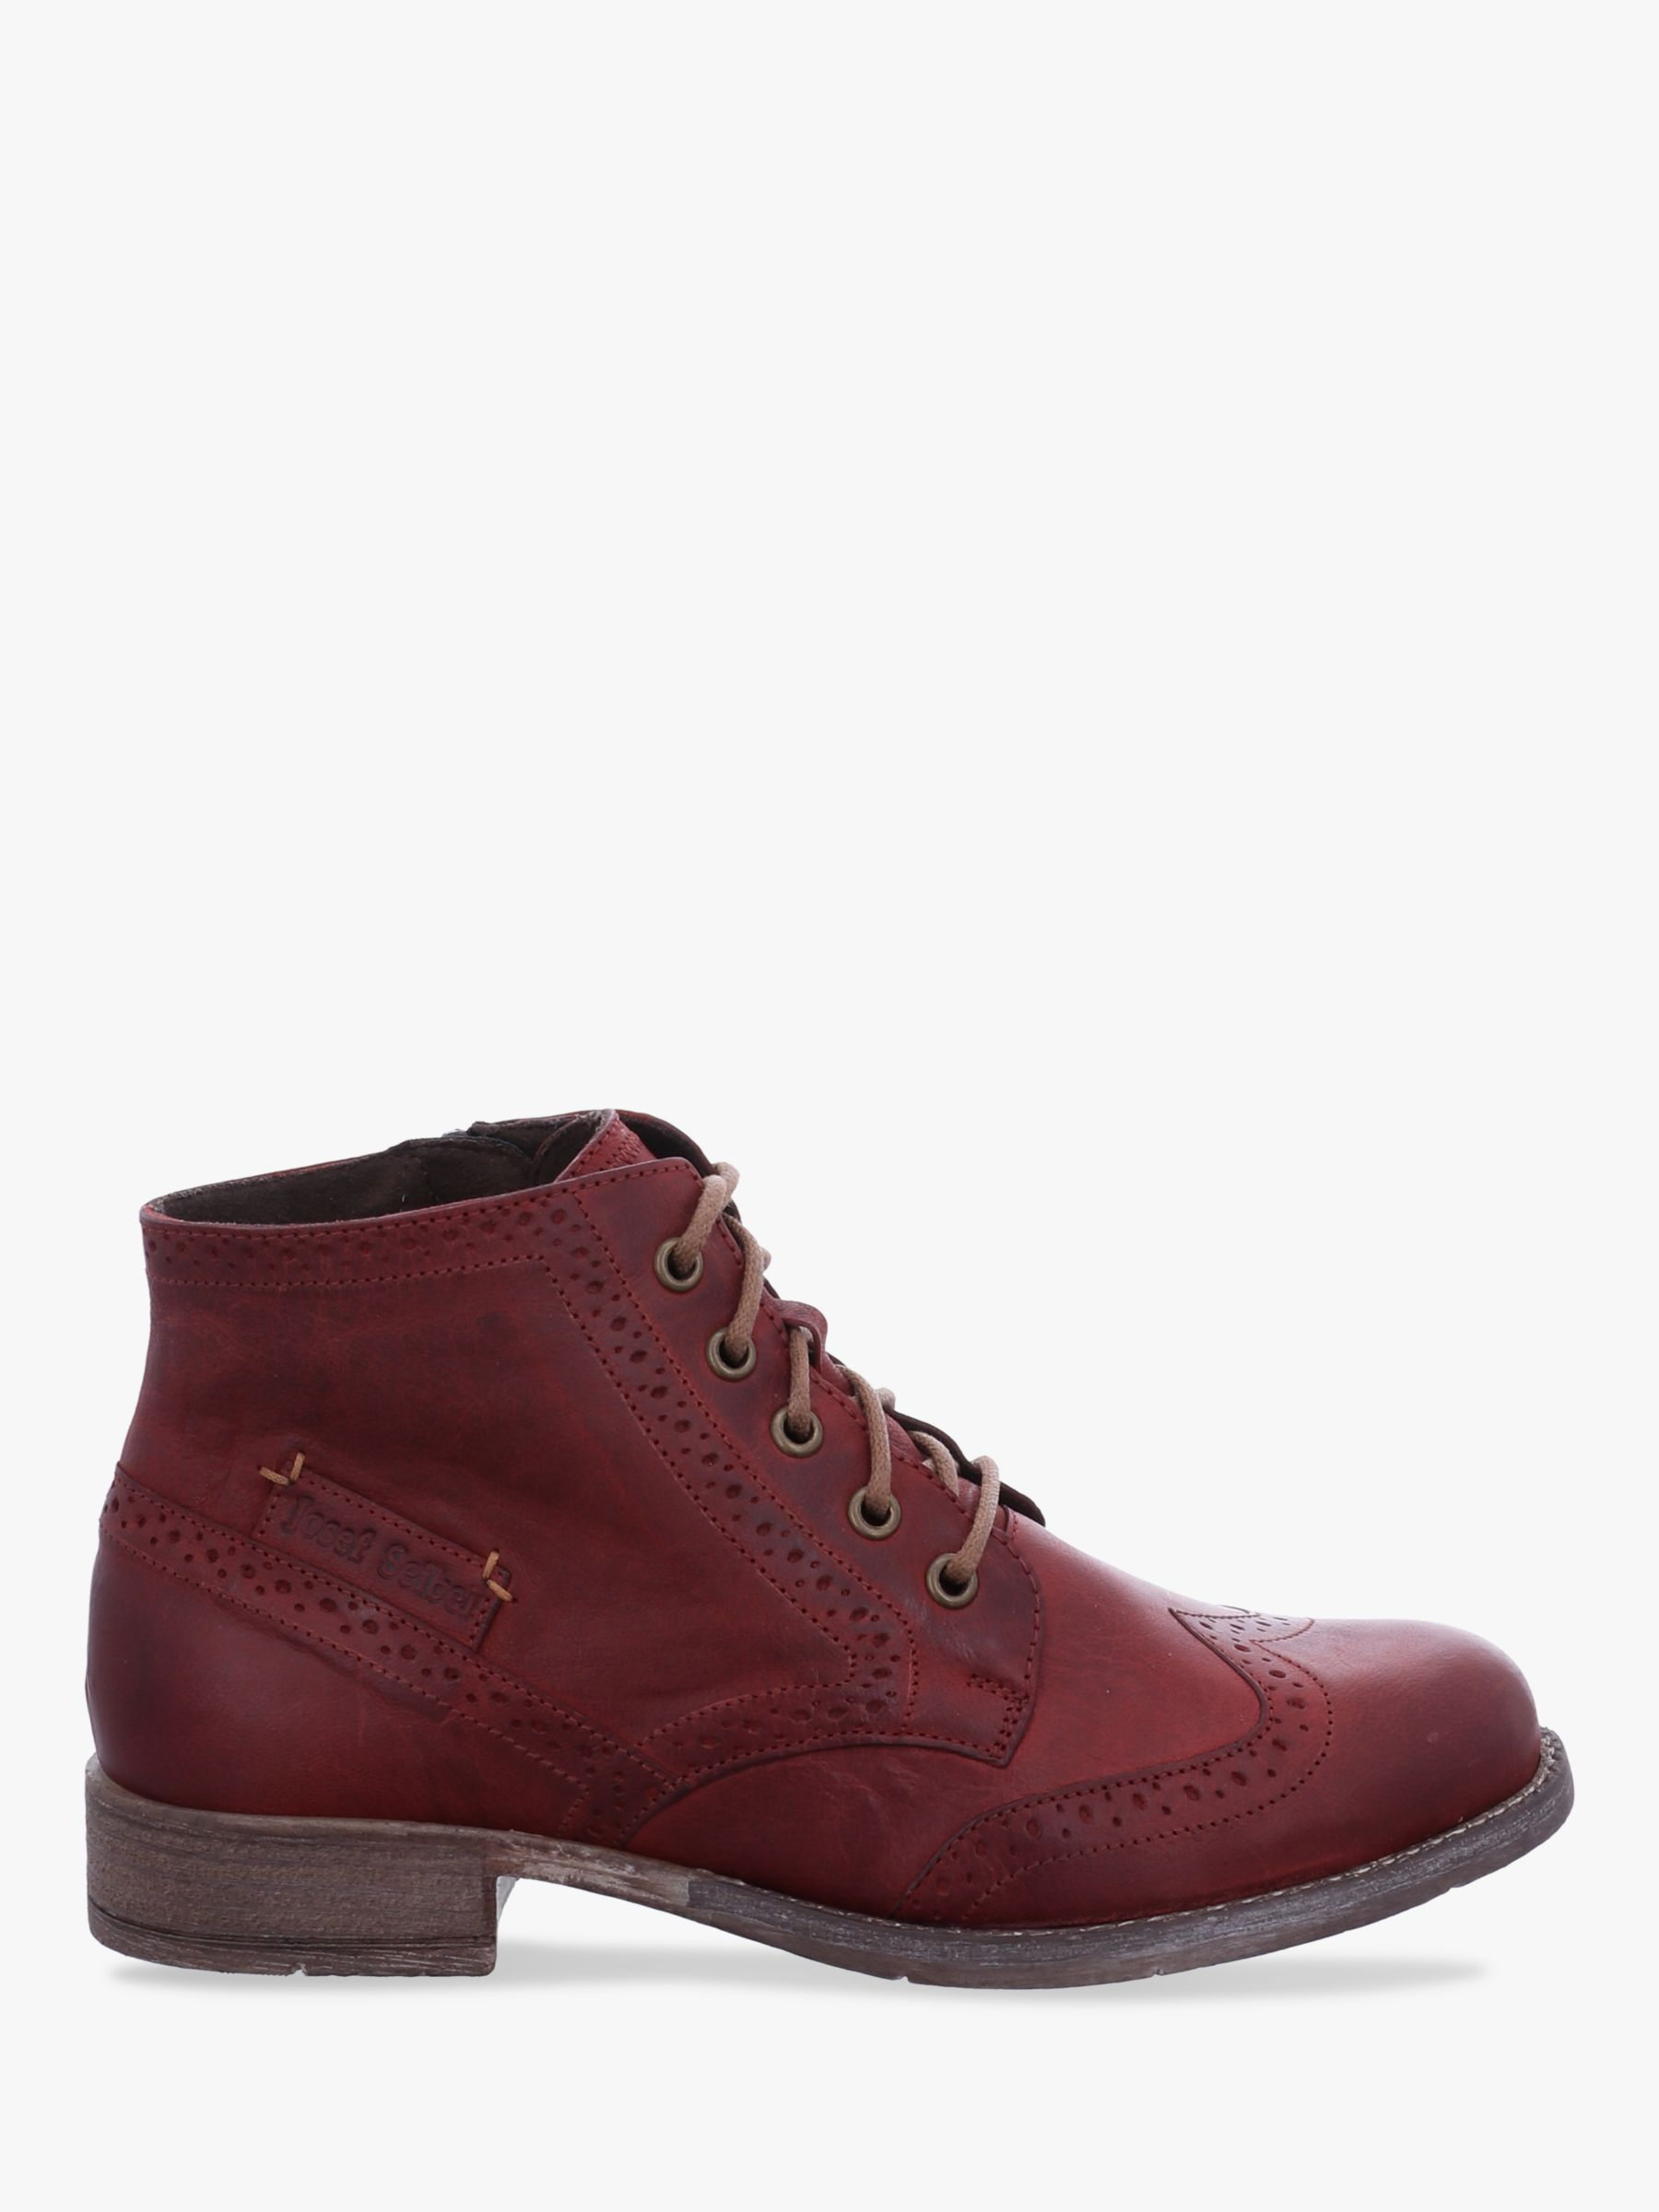 Josef Seibel Josef Seibel Sienna 74 Leather Lace Up Ankle Boots